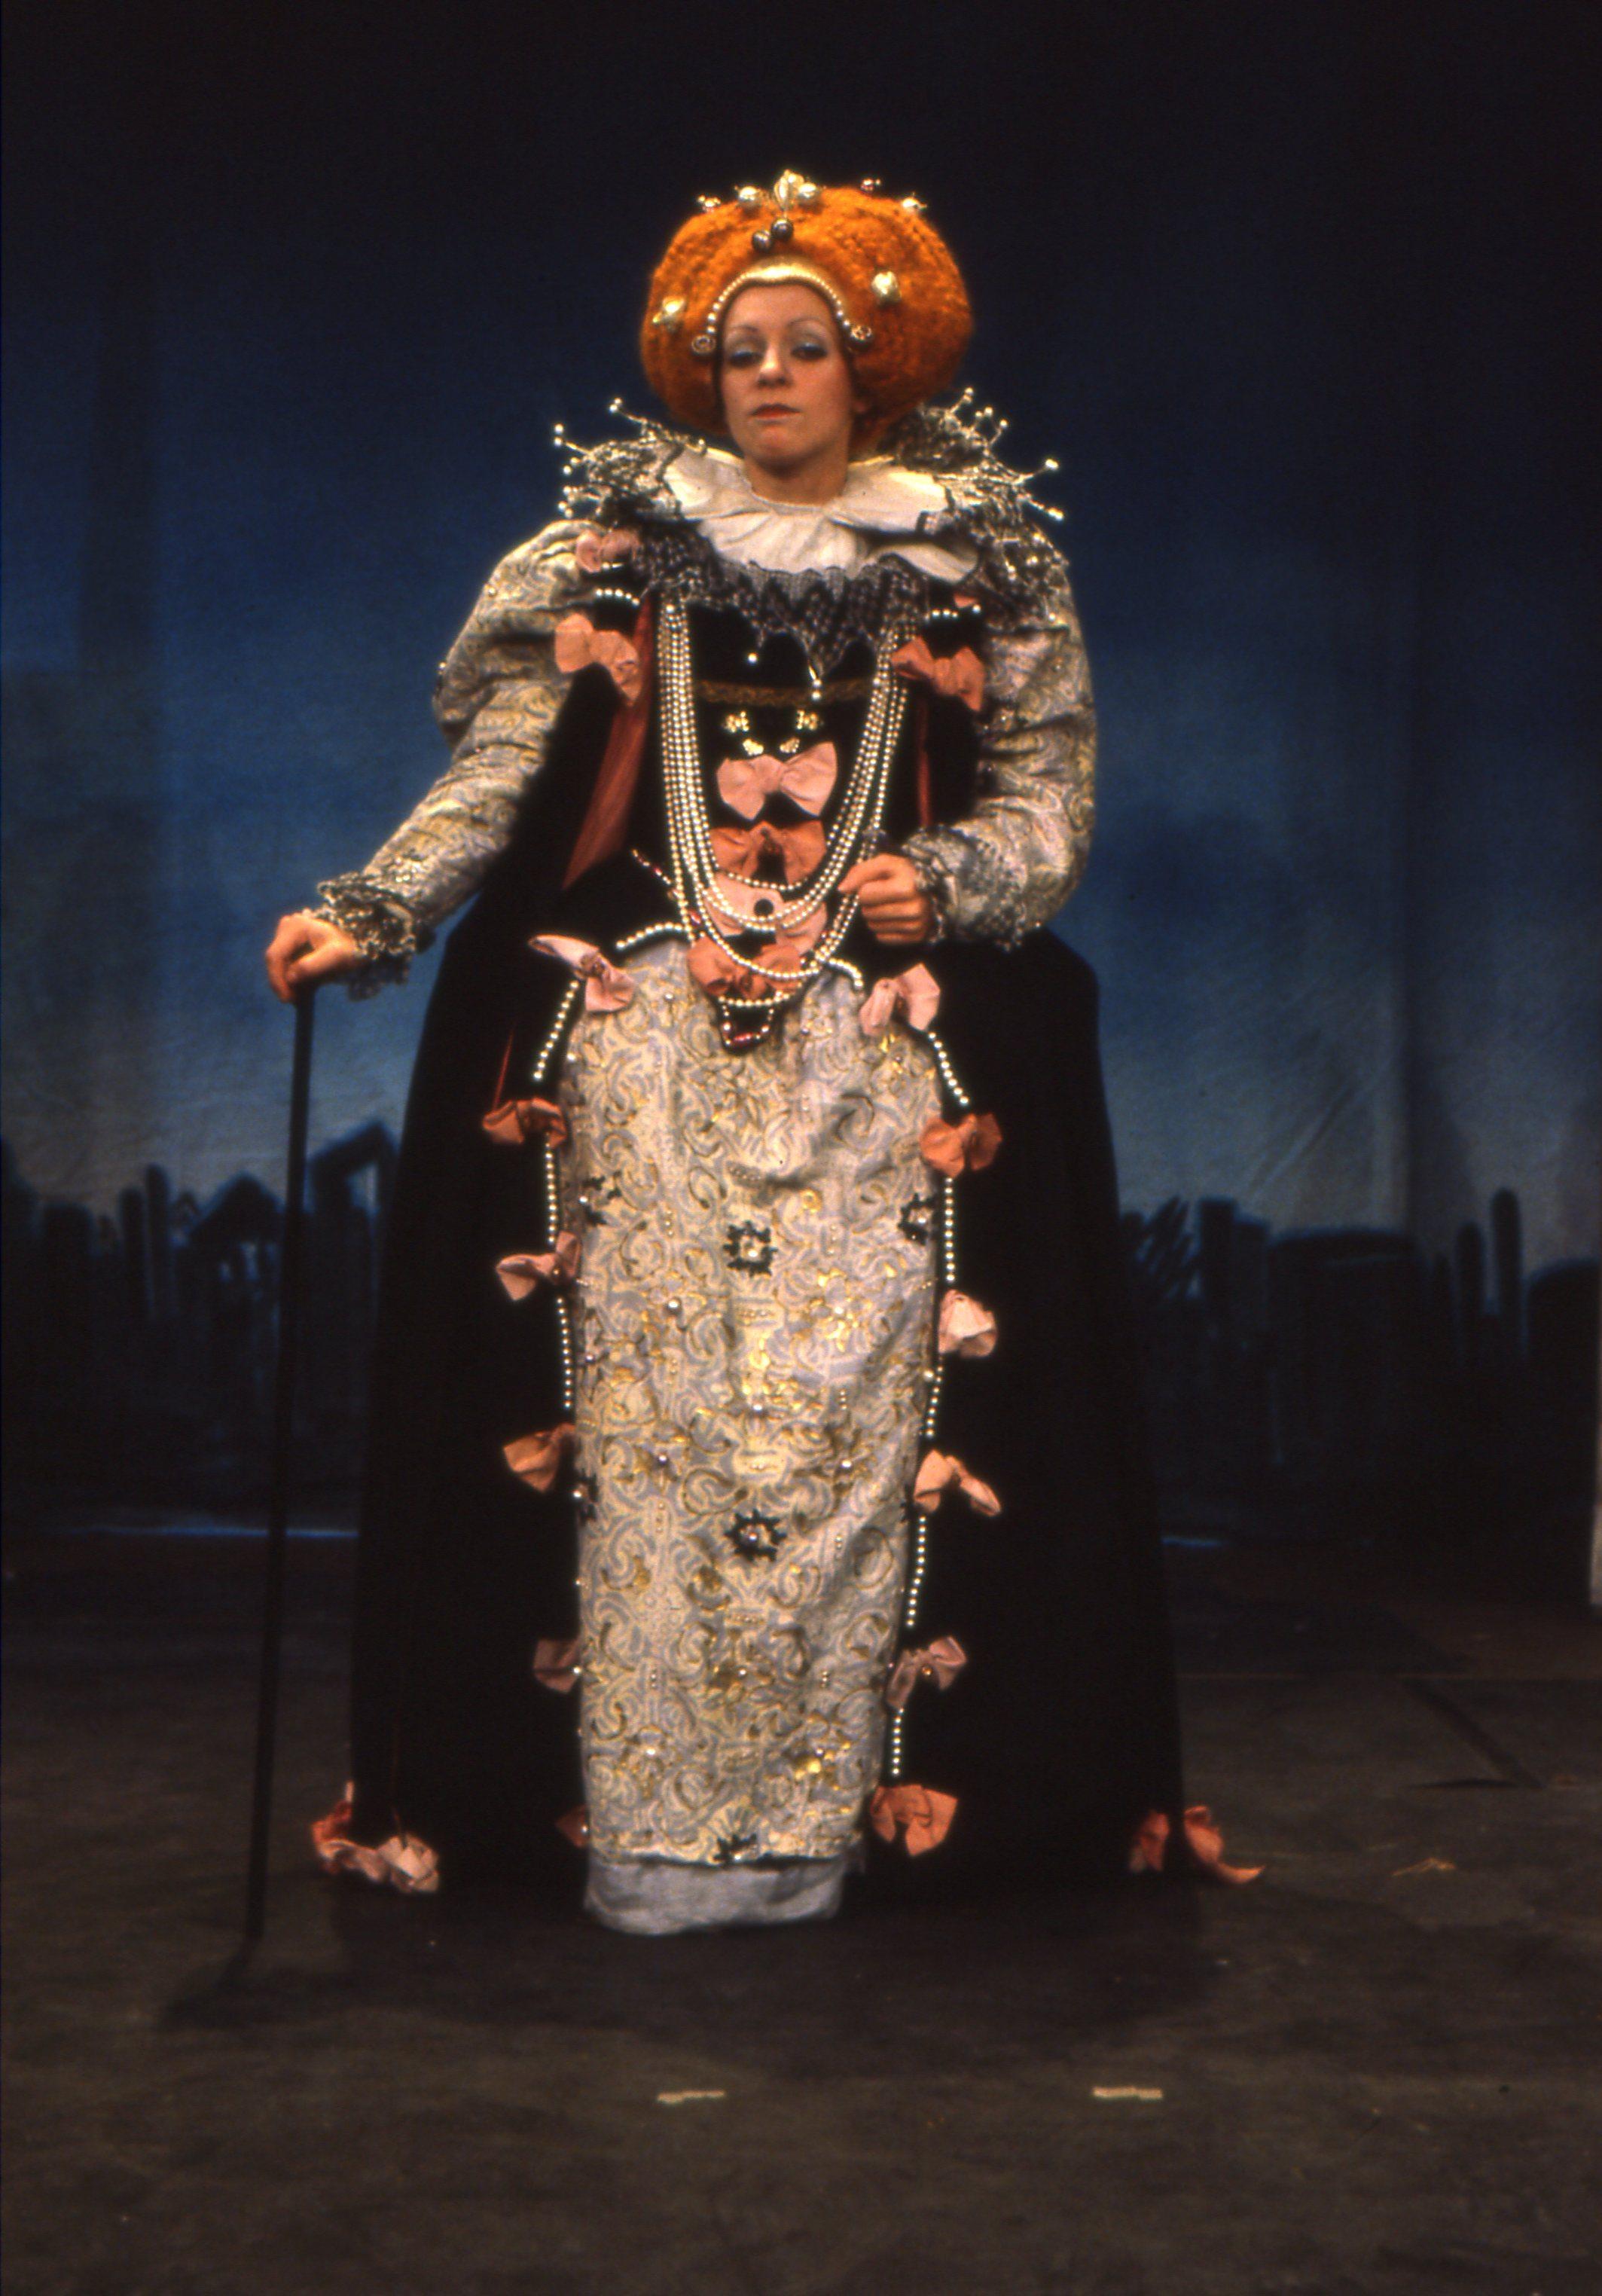 Konni Burger as Elizabeth I for Paradise Street